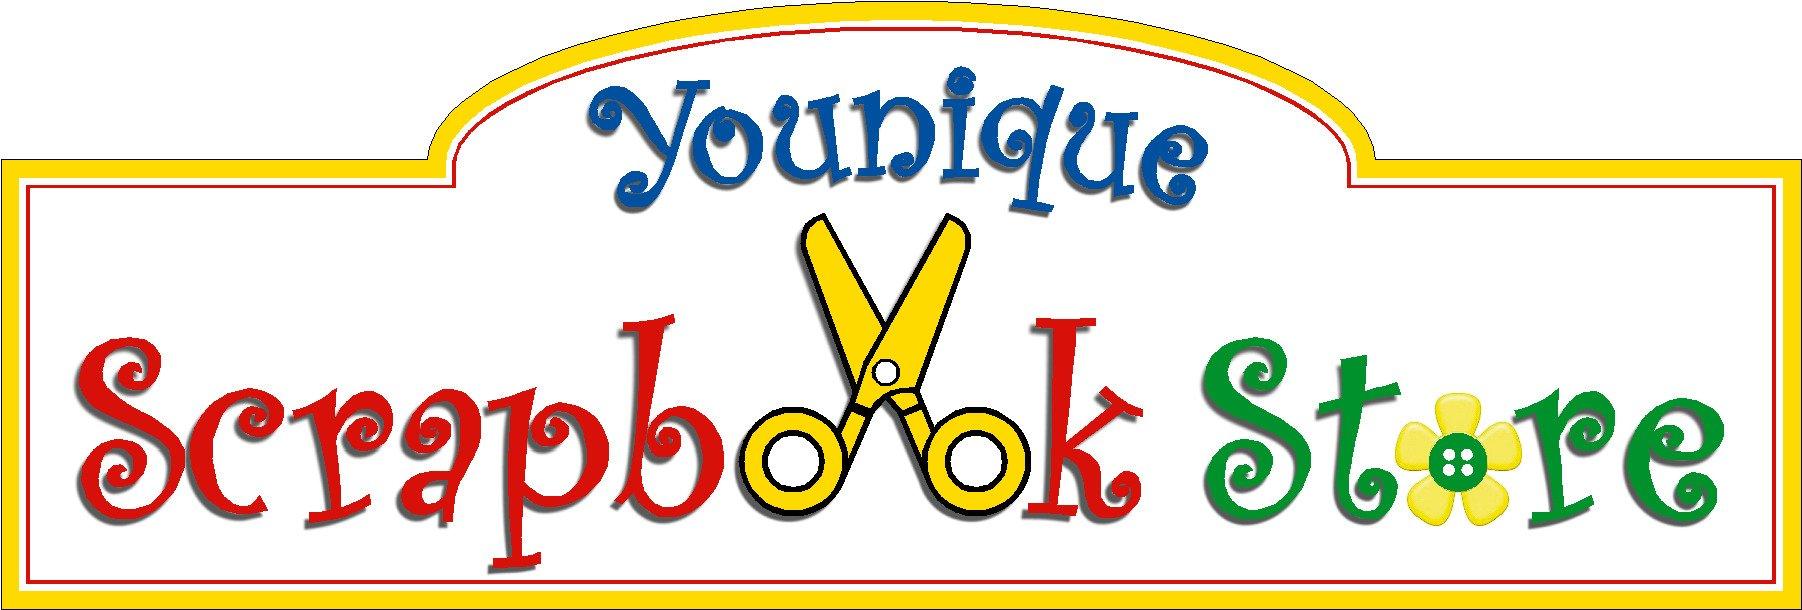 younique scrapbook store logo